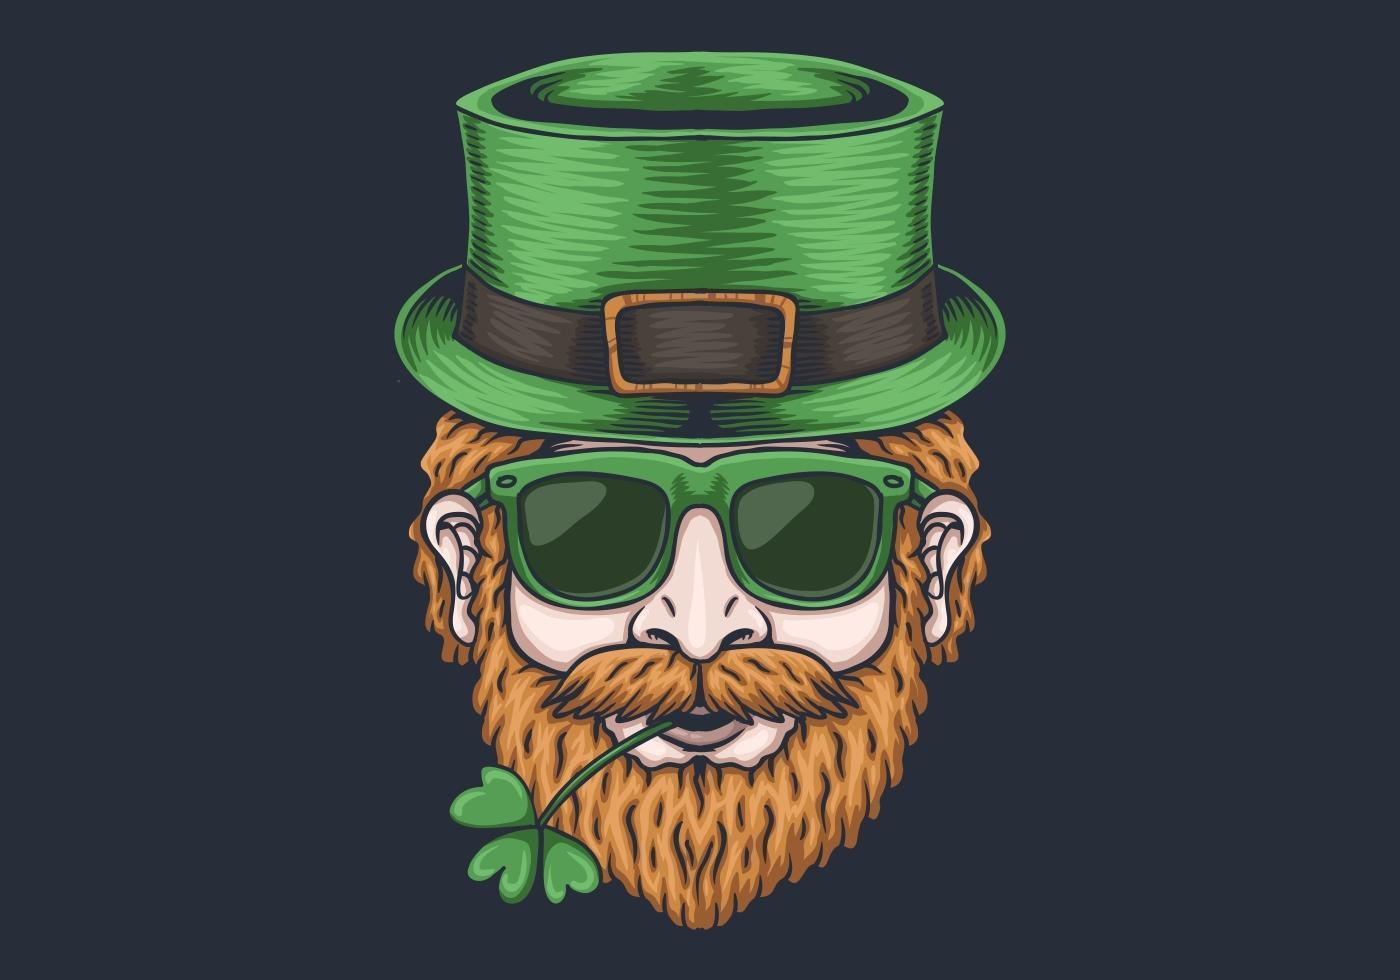 Männerkopf St. Patrick's Day Design vektor